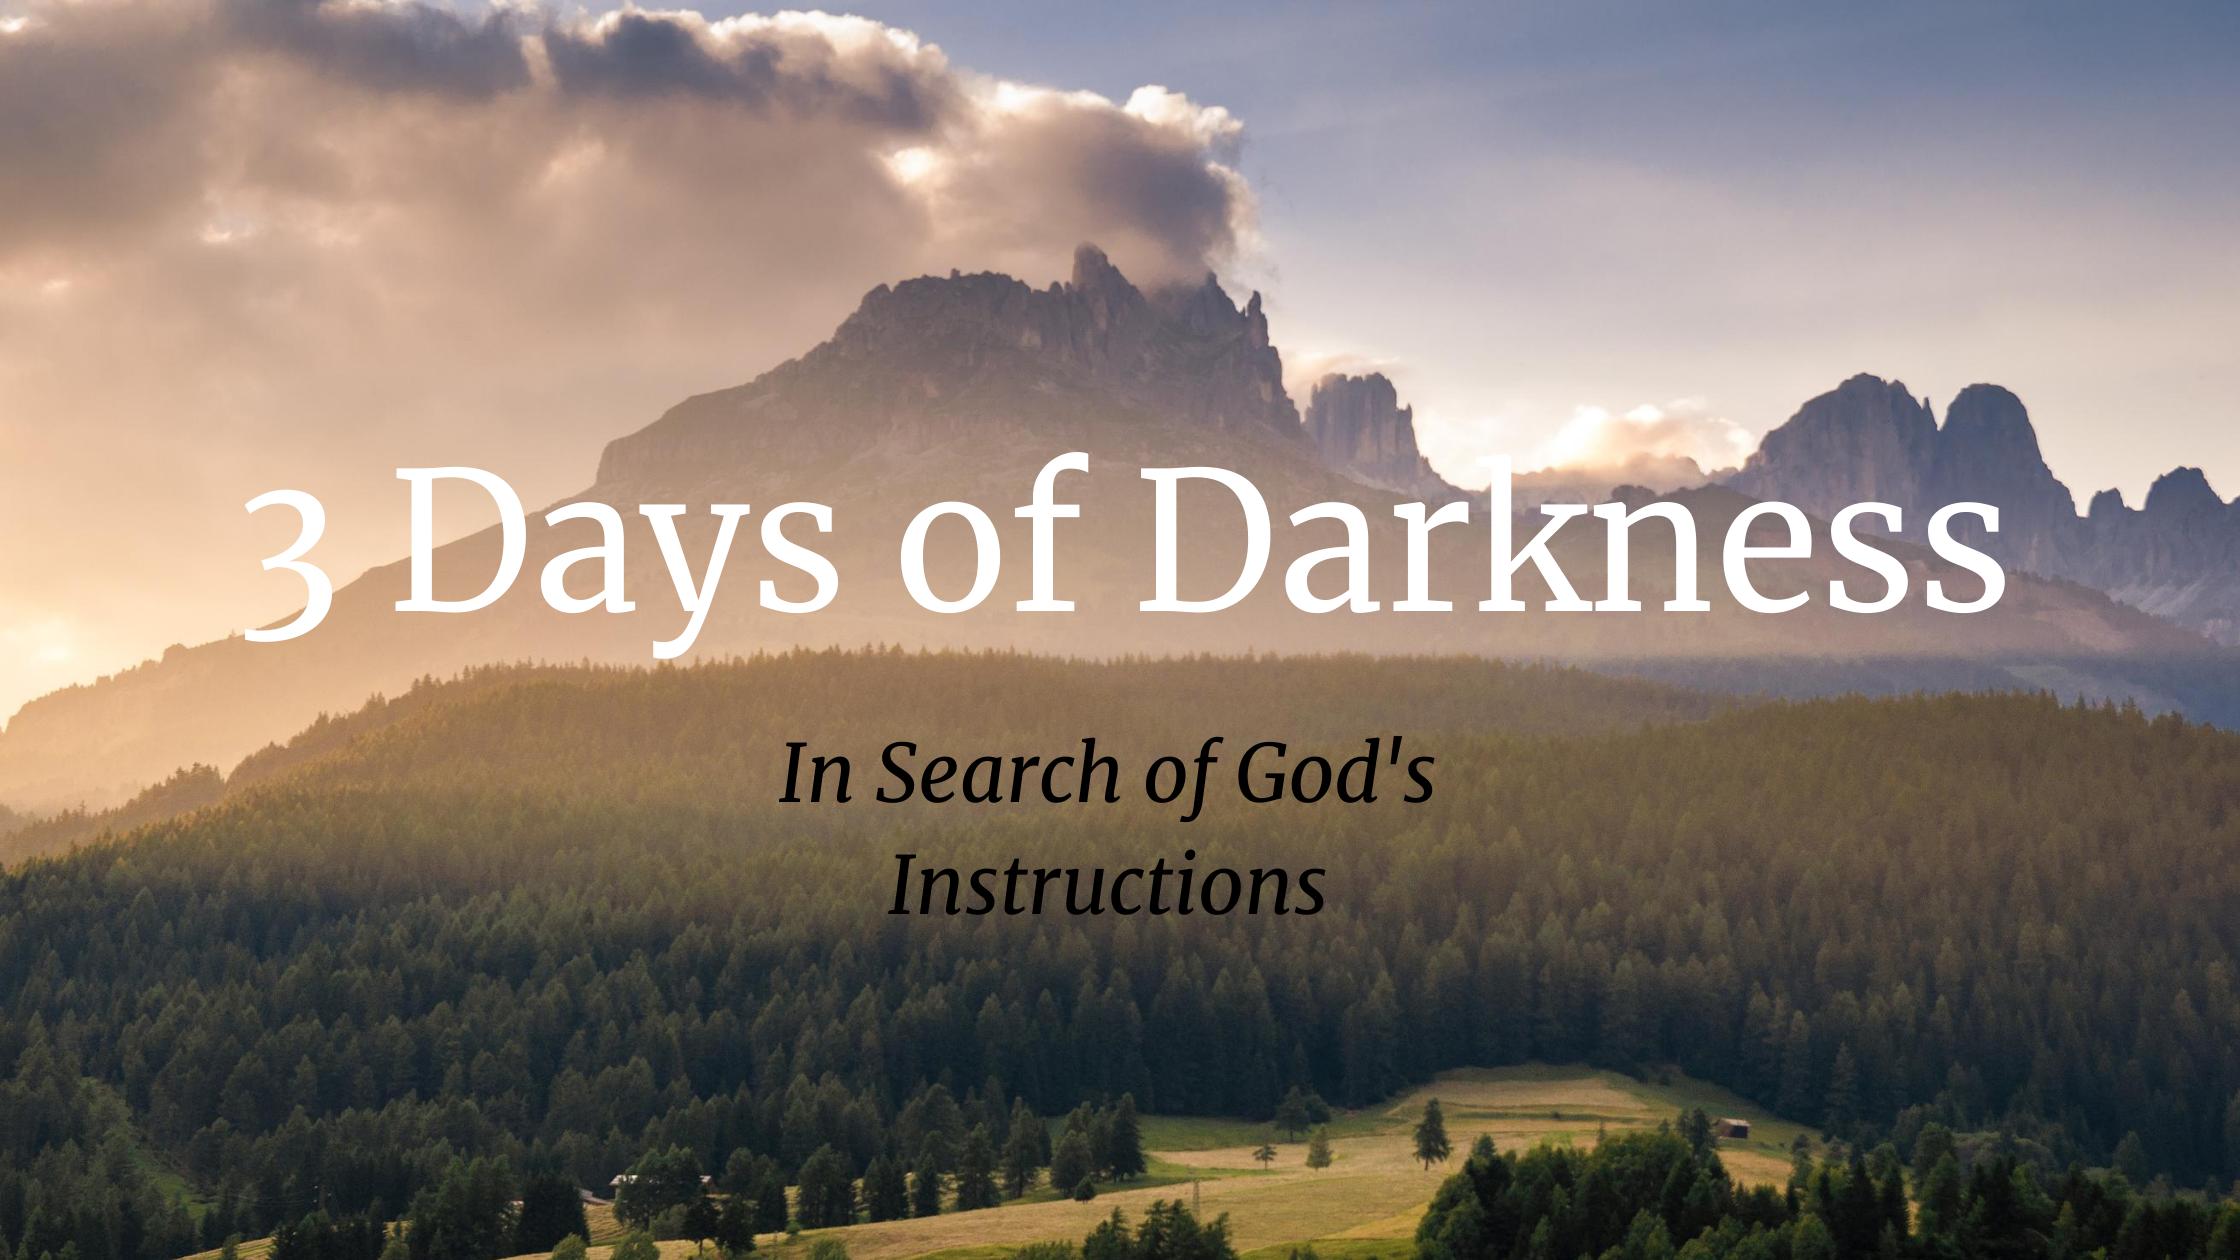 3 Days of Darkness